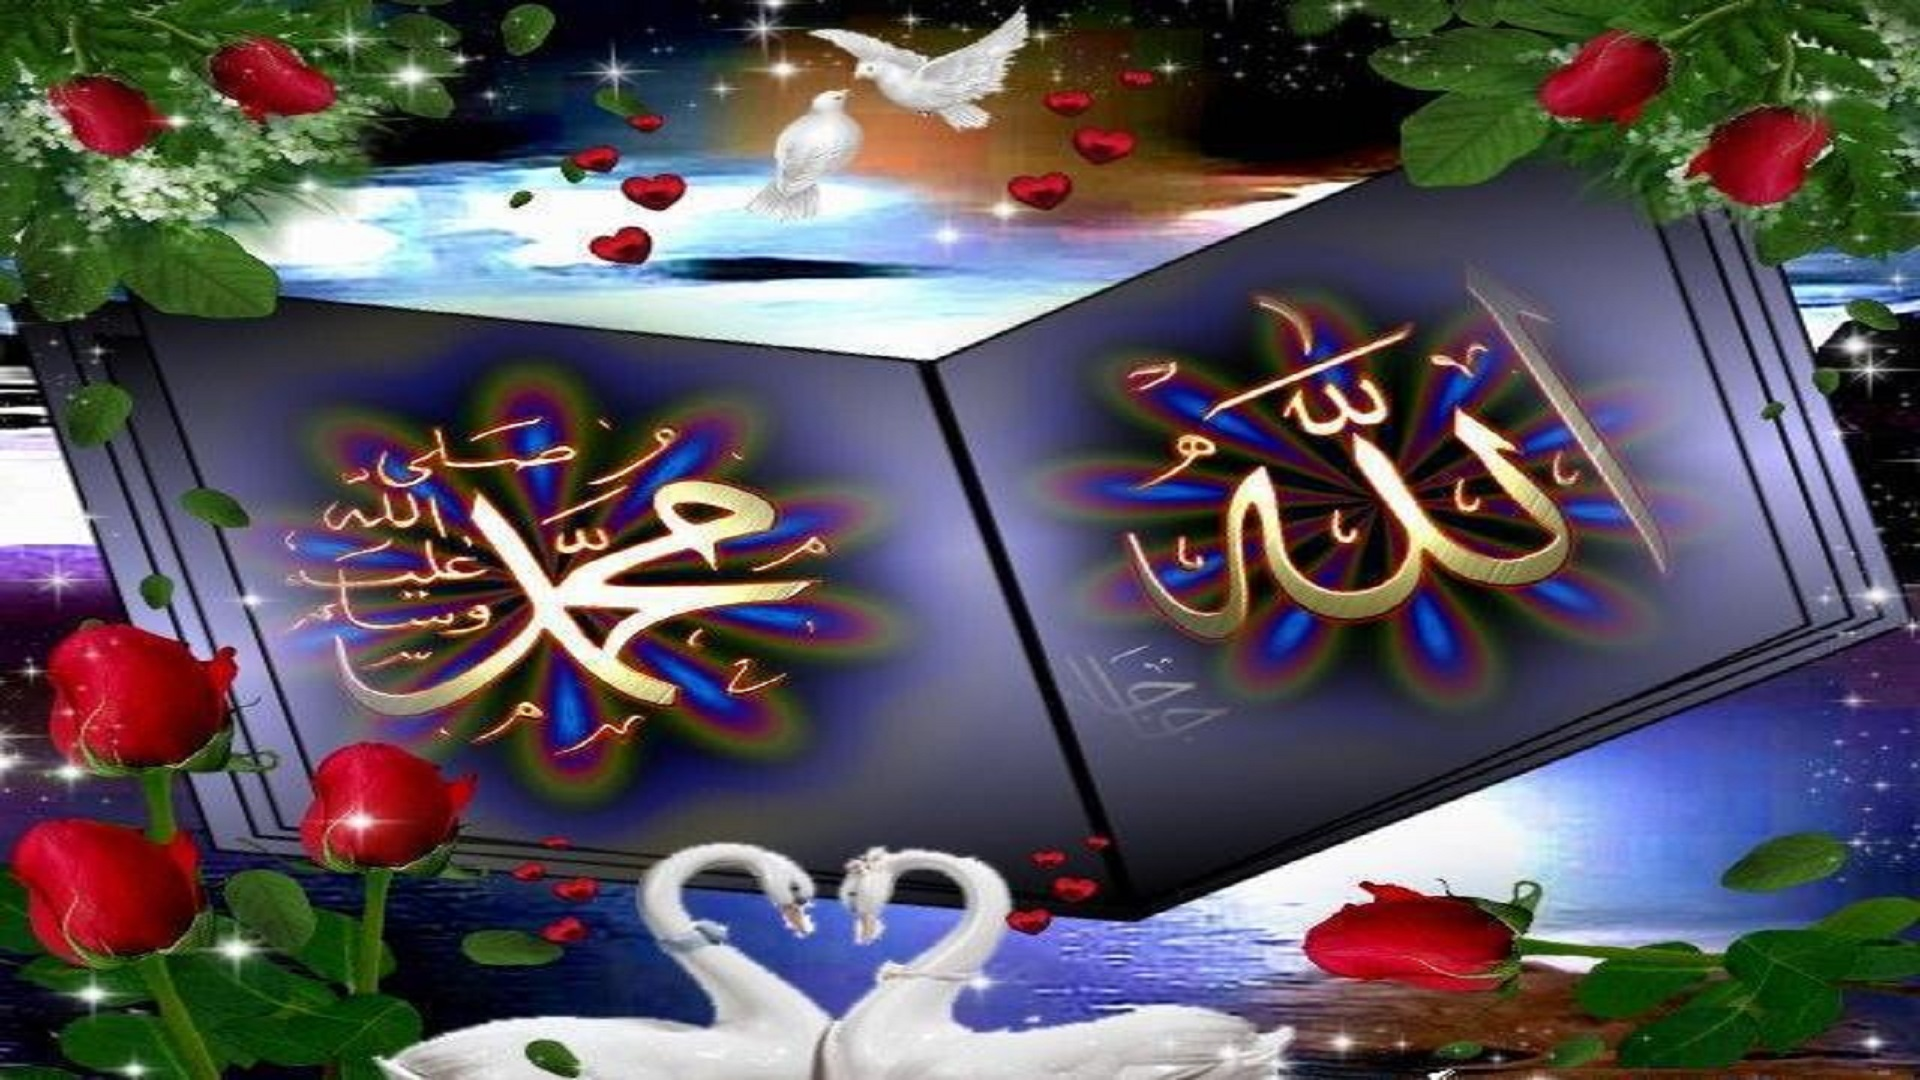 Islamic Free So Nice Hd Wallpapers For Desktop Hd Wallpaper